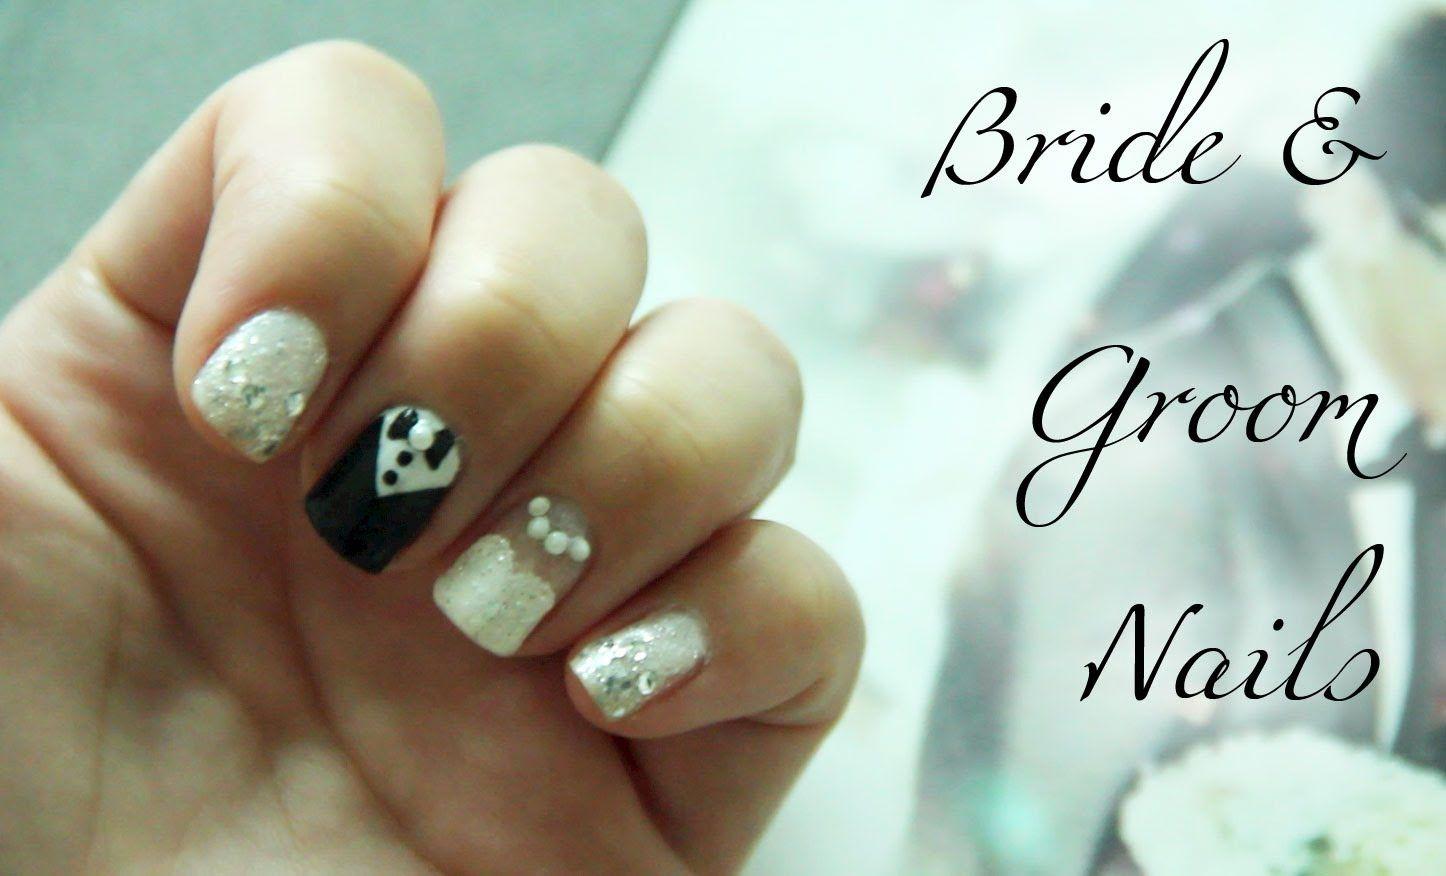 Bride Groom Nails By Bubzbeauty